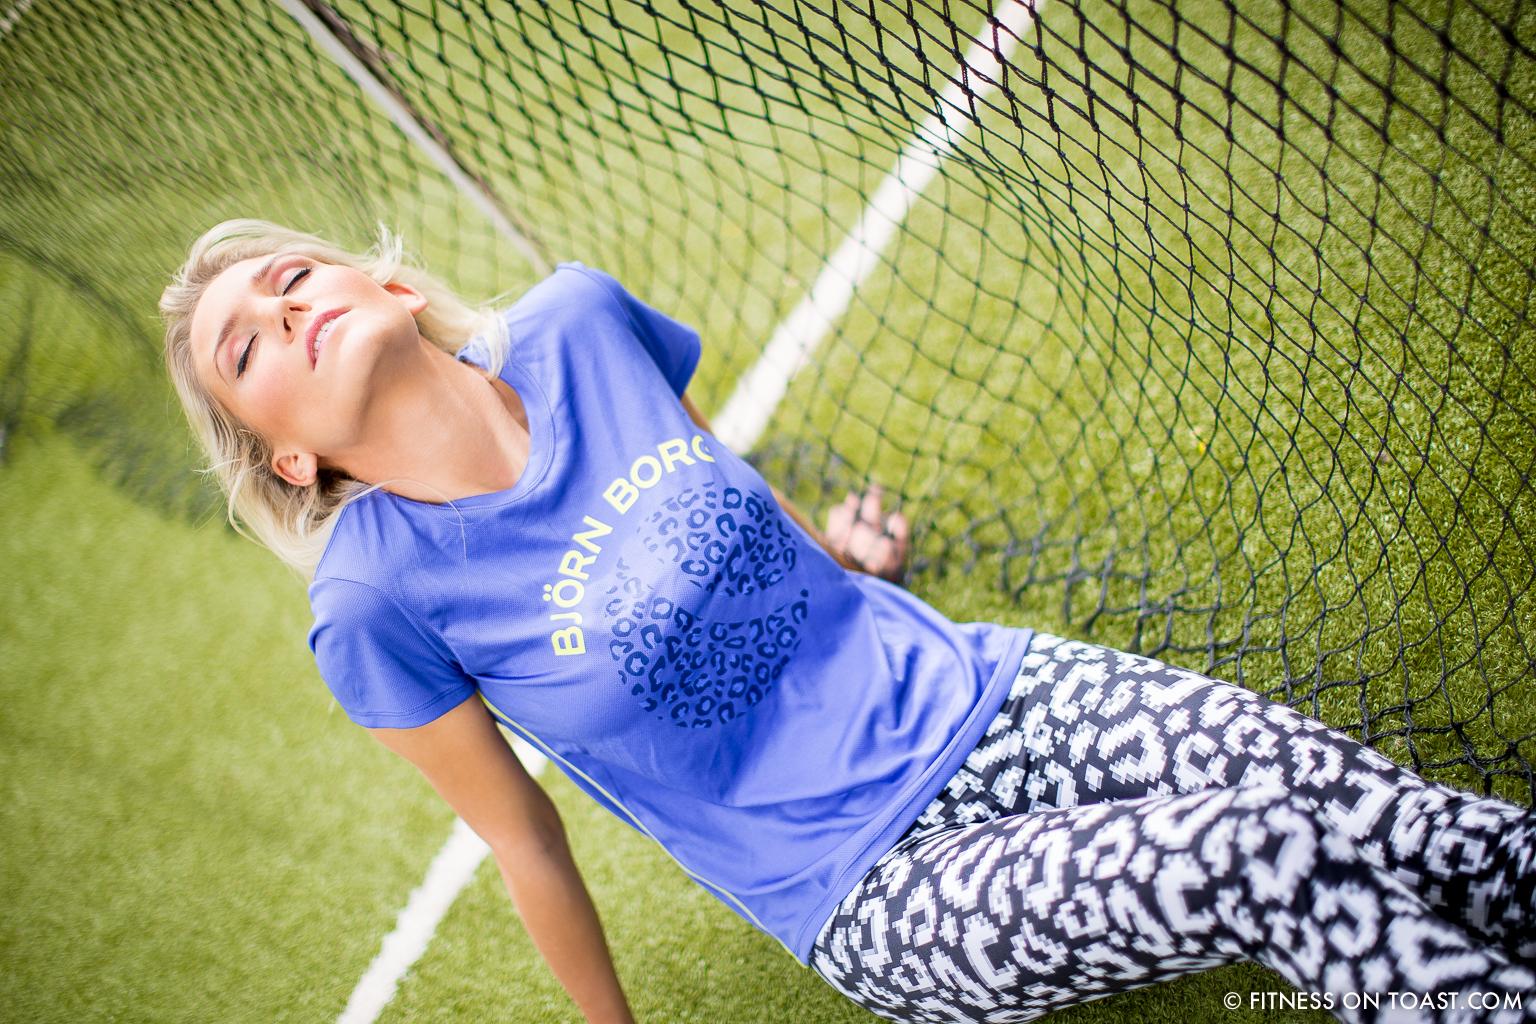 Fitness On Toast Faya Blog Bjorn Borg Tennis Fashion Gym Activewear Active Sports Kit Training Clothes Fitness Fashion Leggings Tshirt Workout-5